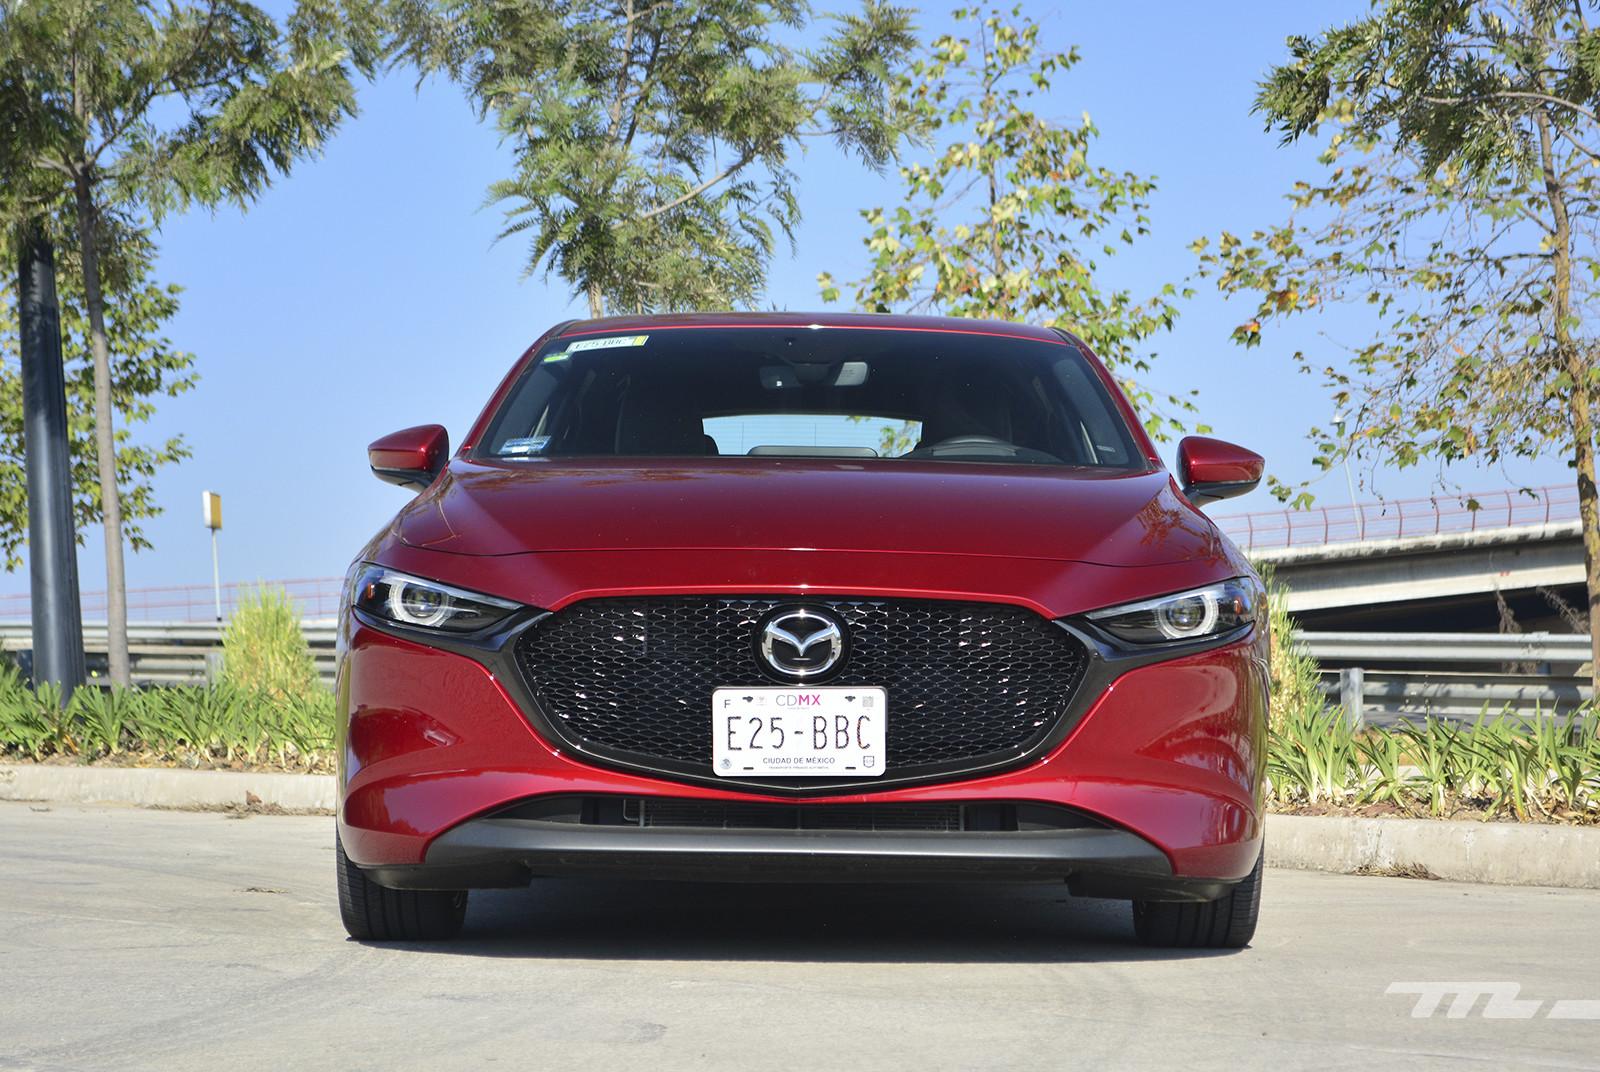 Foto de Mazda 3 vs. SEAT León (comparativa) (12/28)